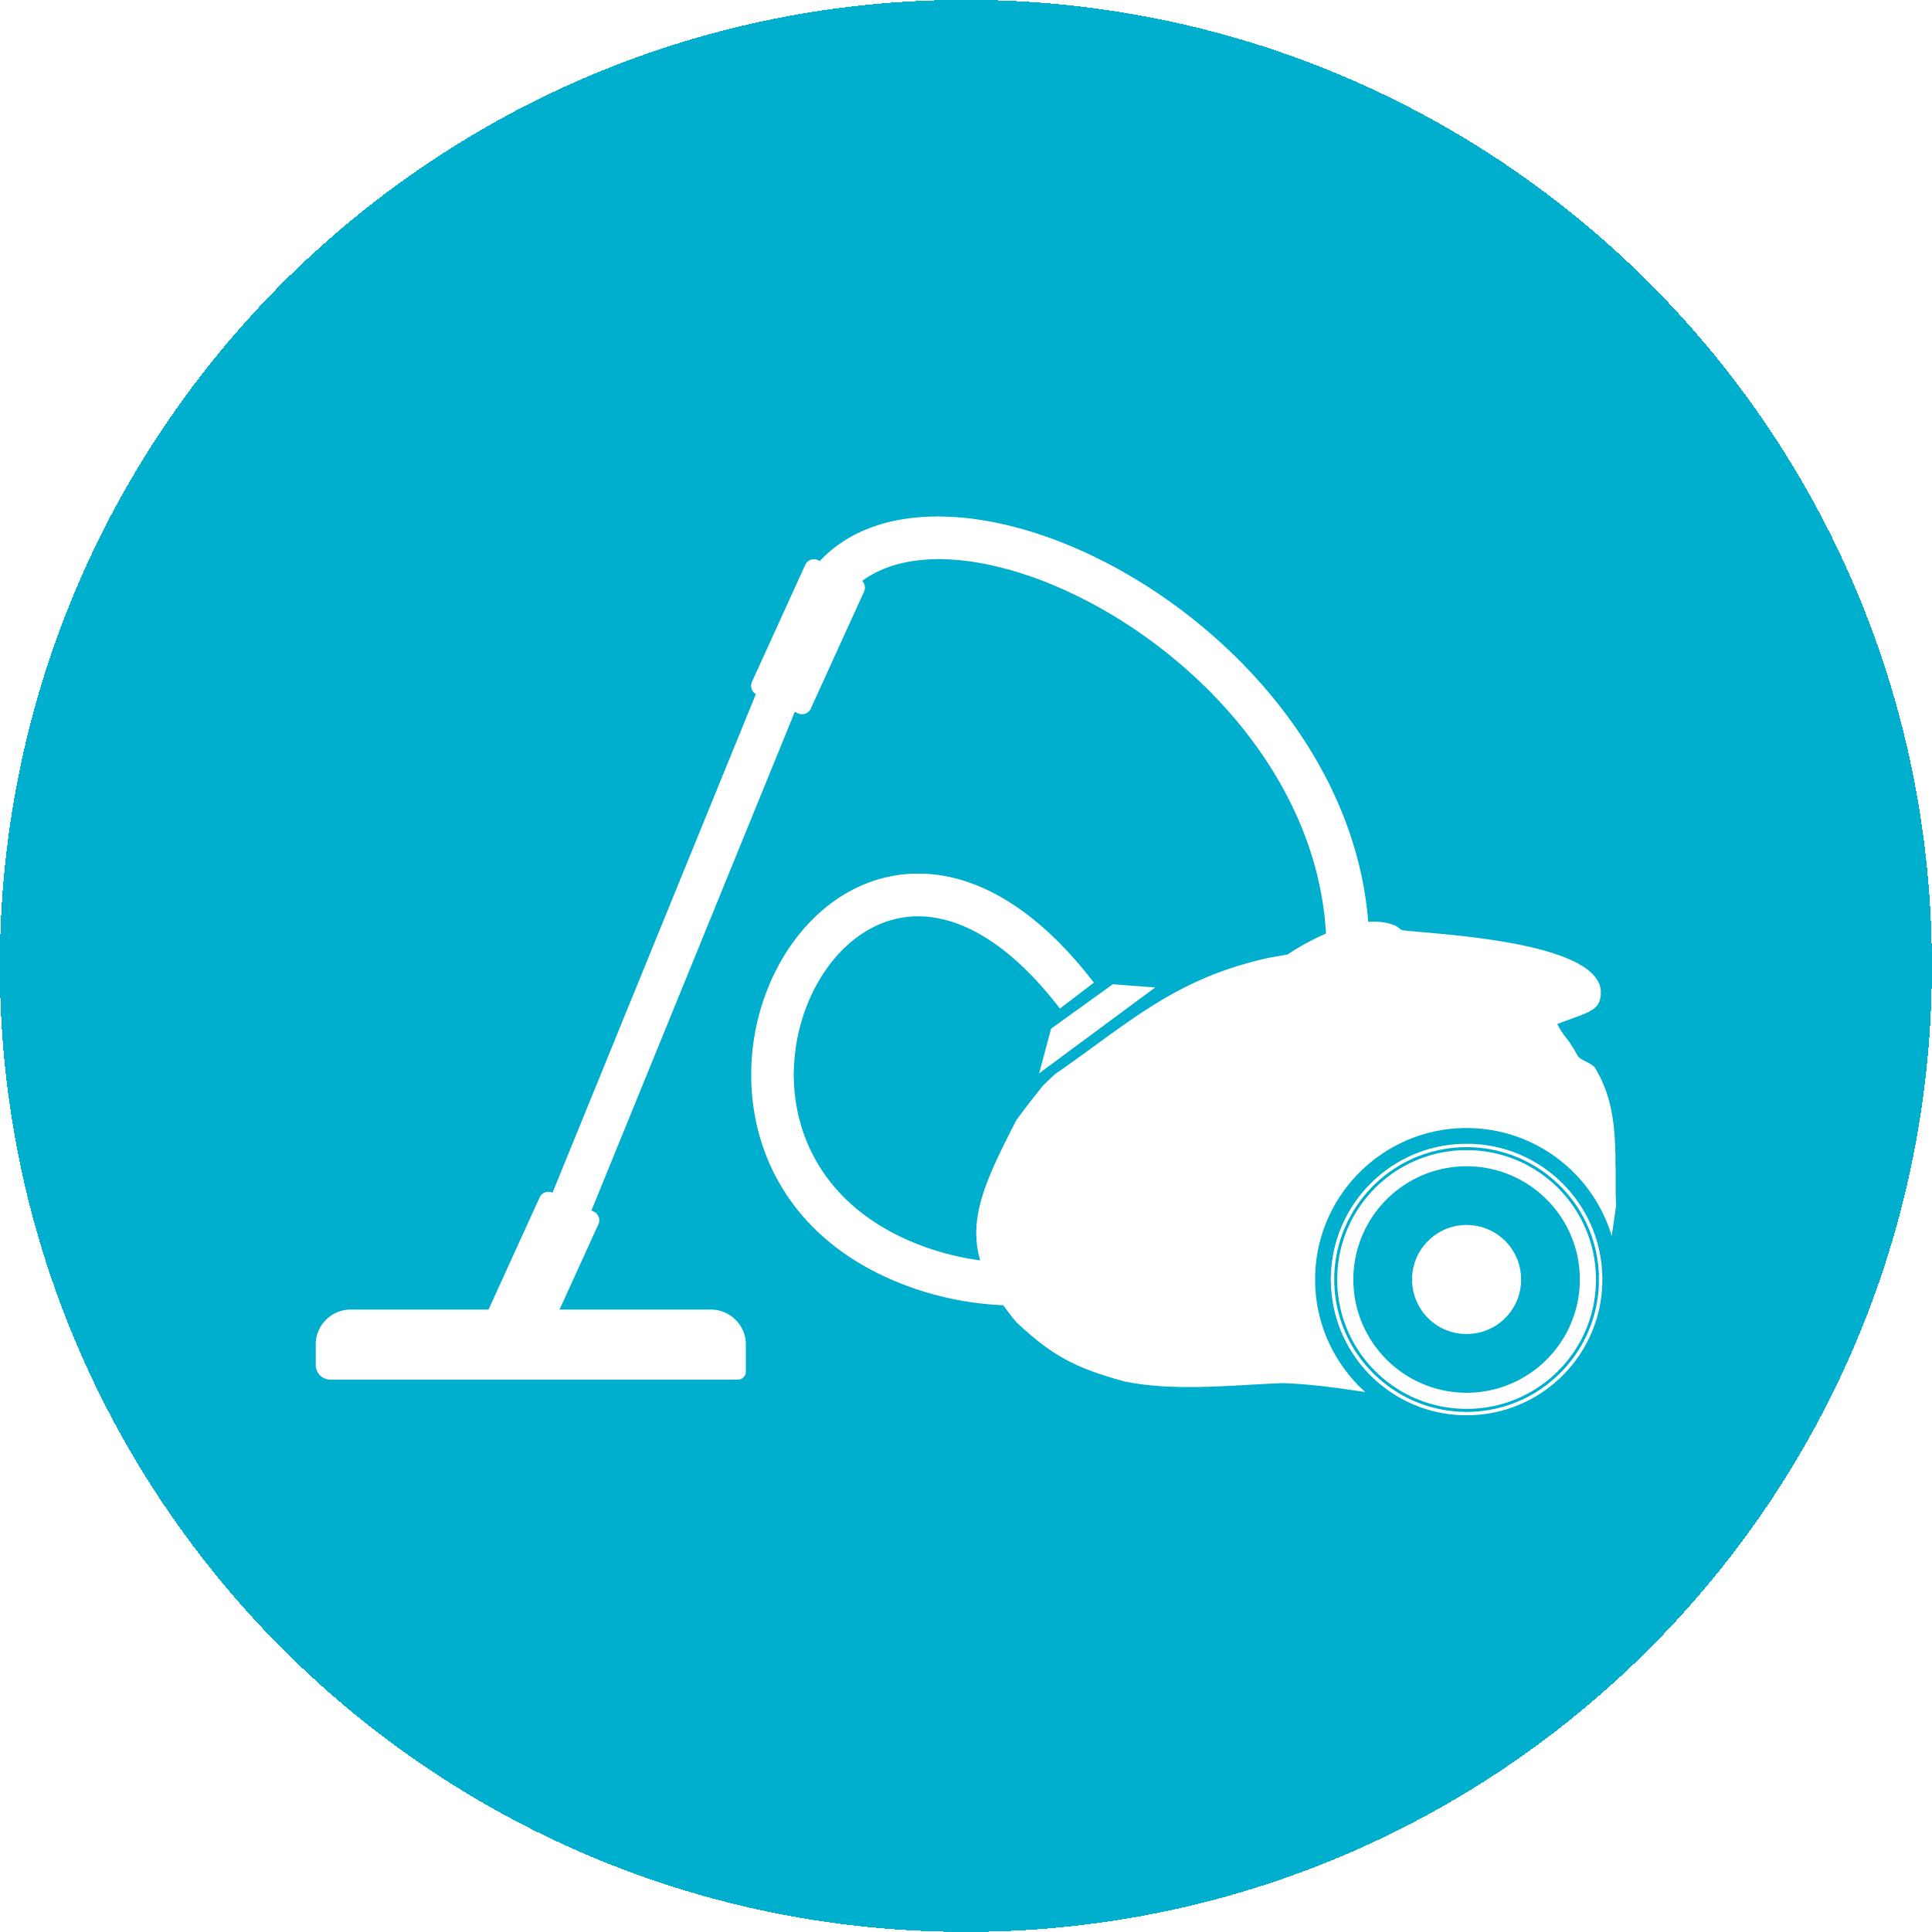 Innovatieve reinigingsmachines